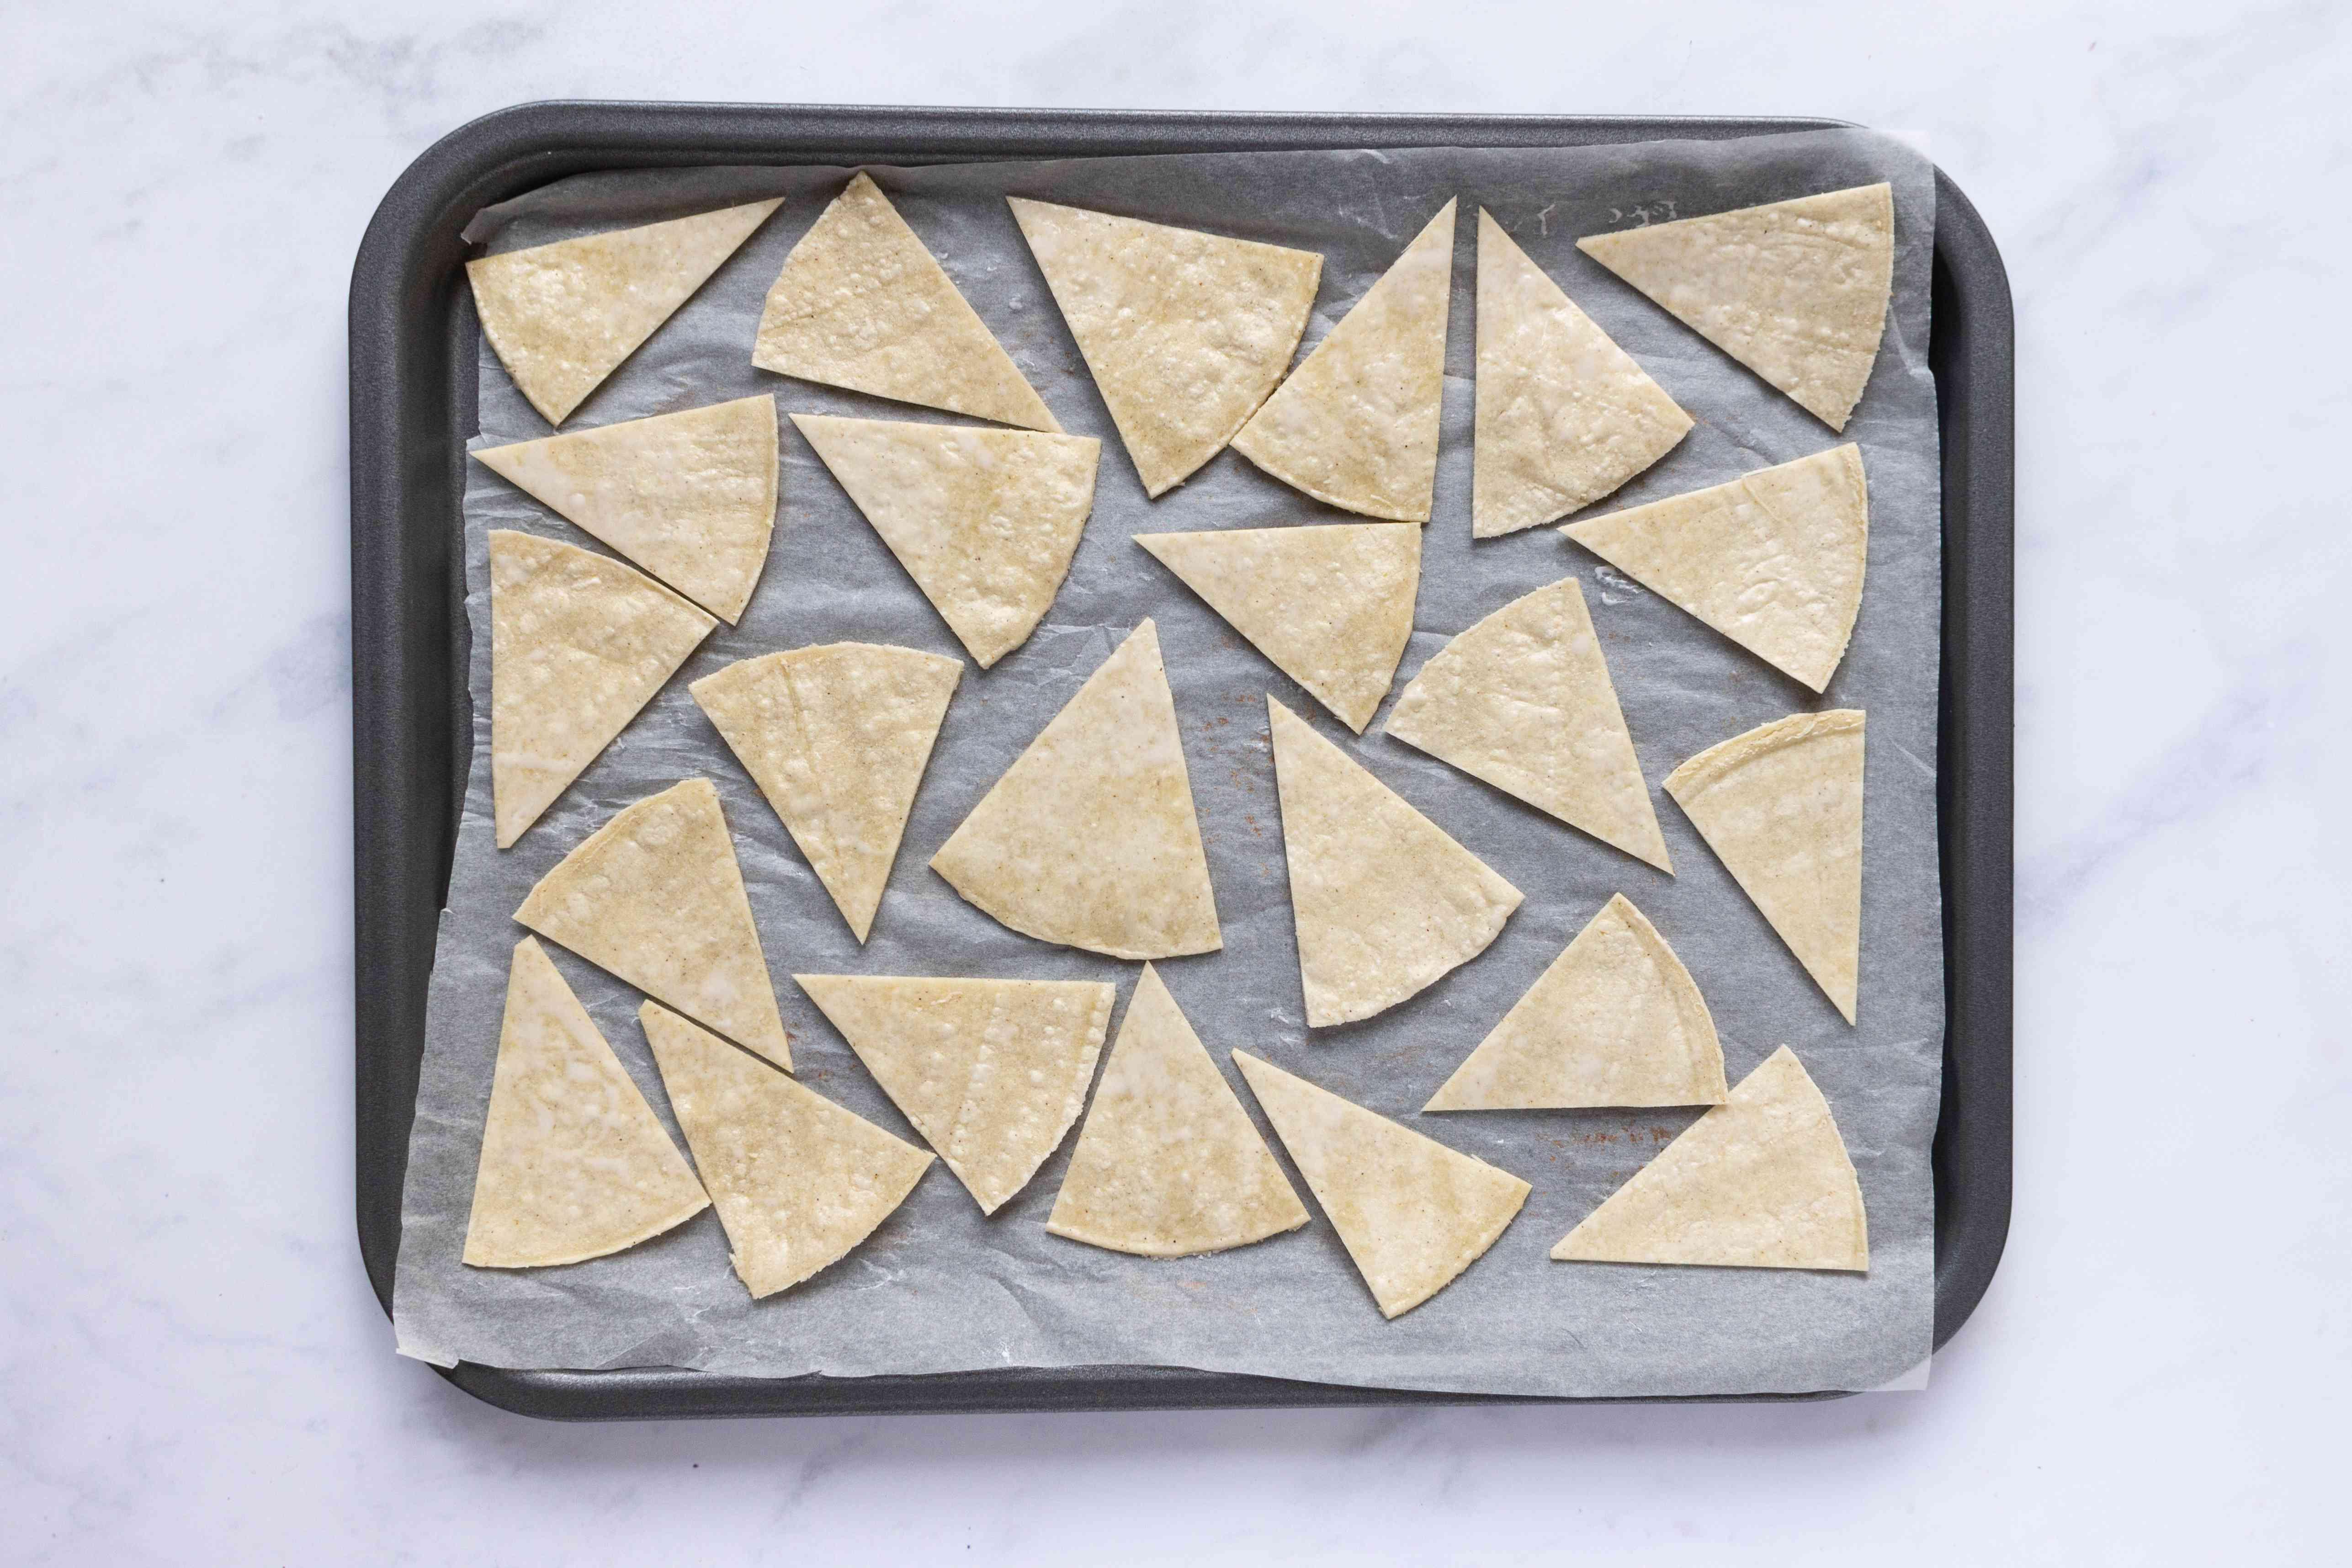 tortilla pieces on a baking sheet